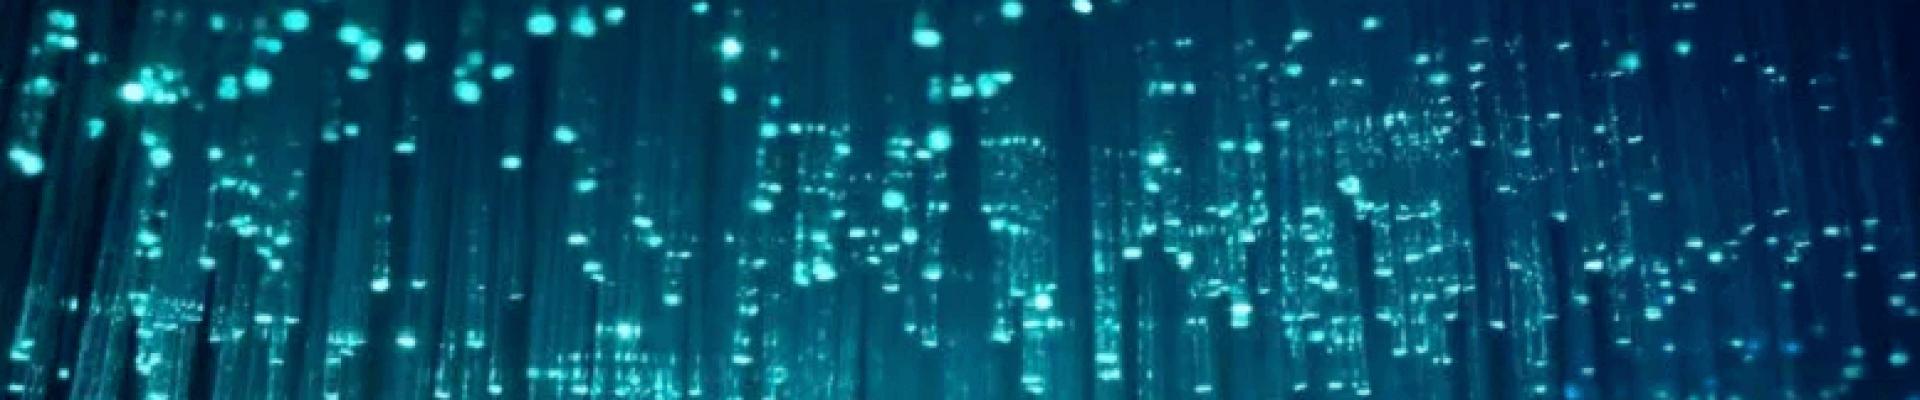 LiteLink-Technologies-Inc.-1-3.png